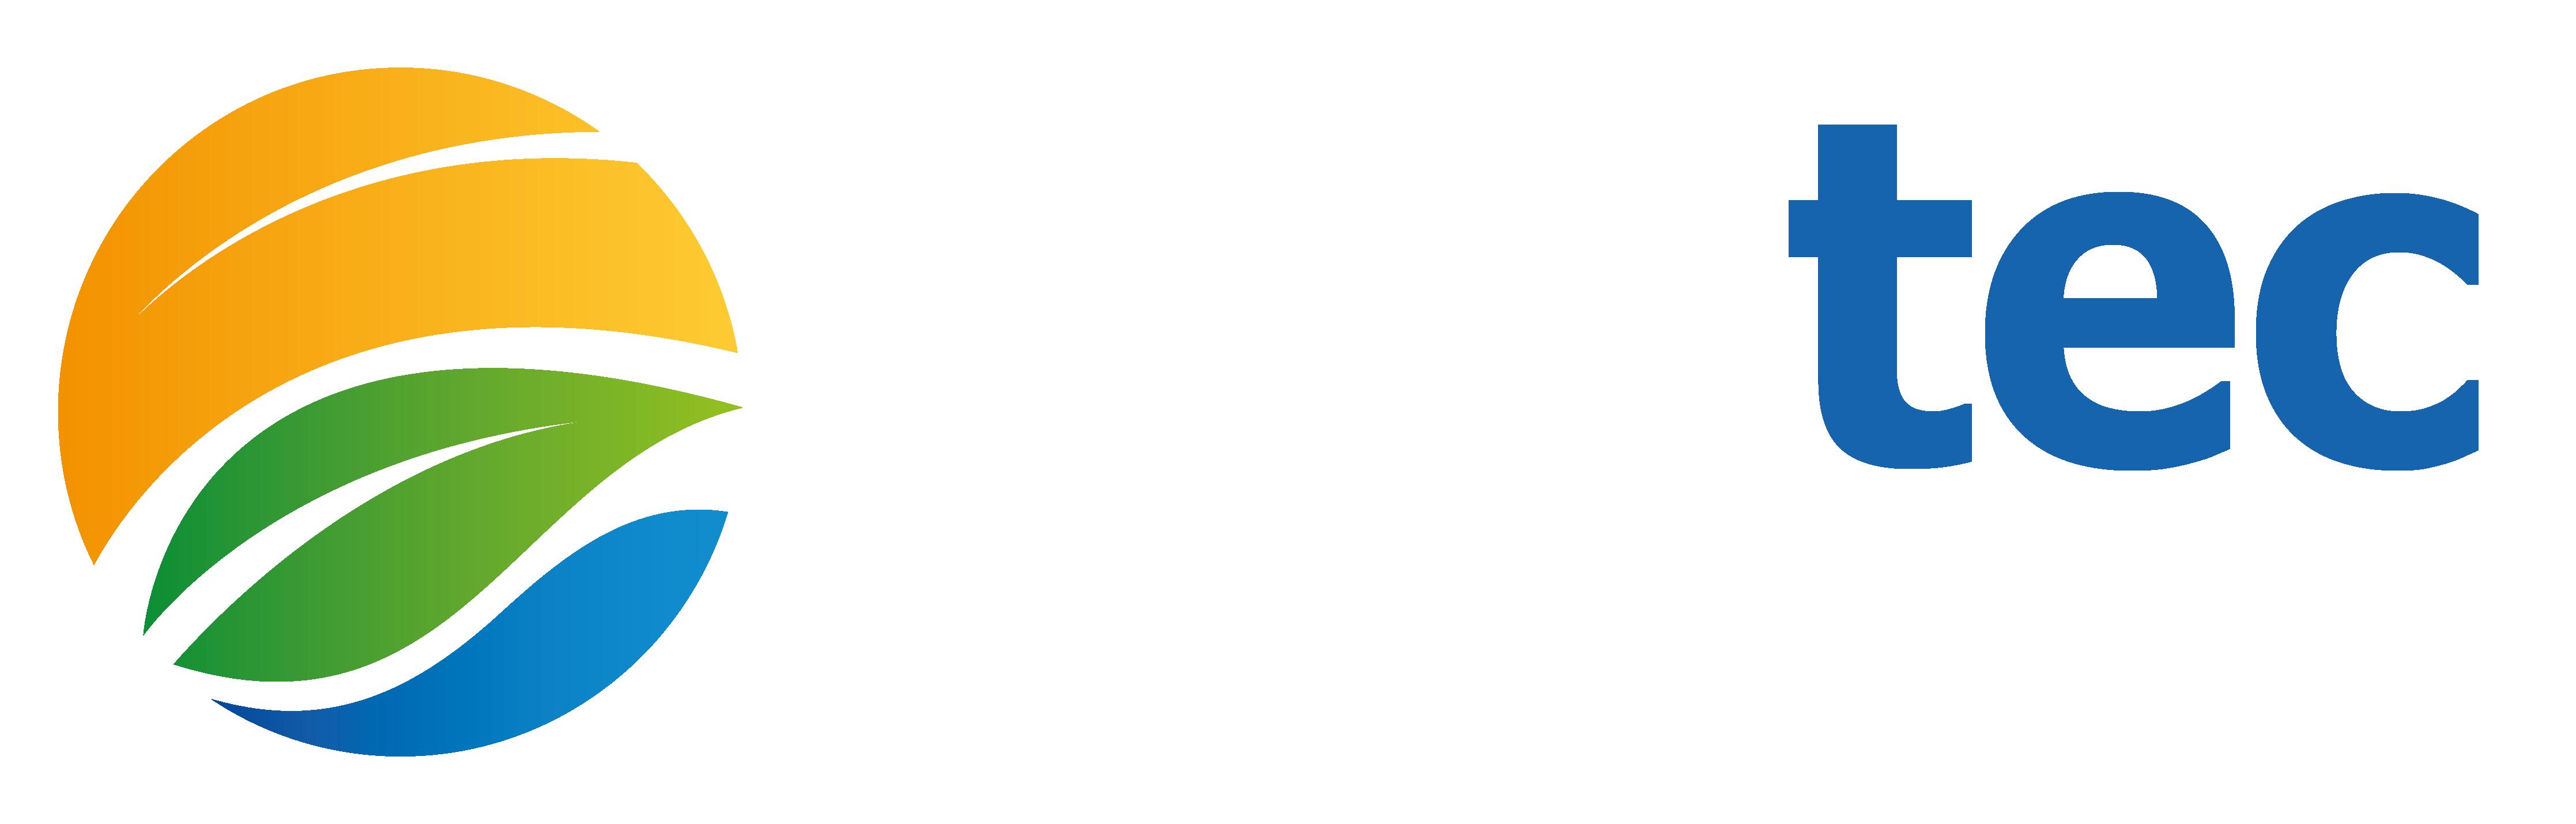 flowtec Gebäudetechnik